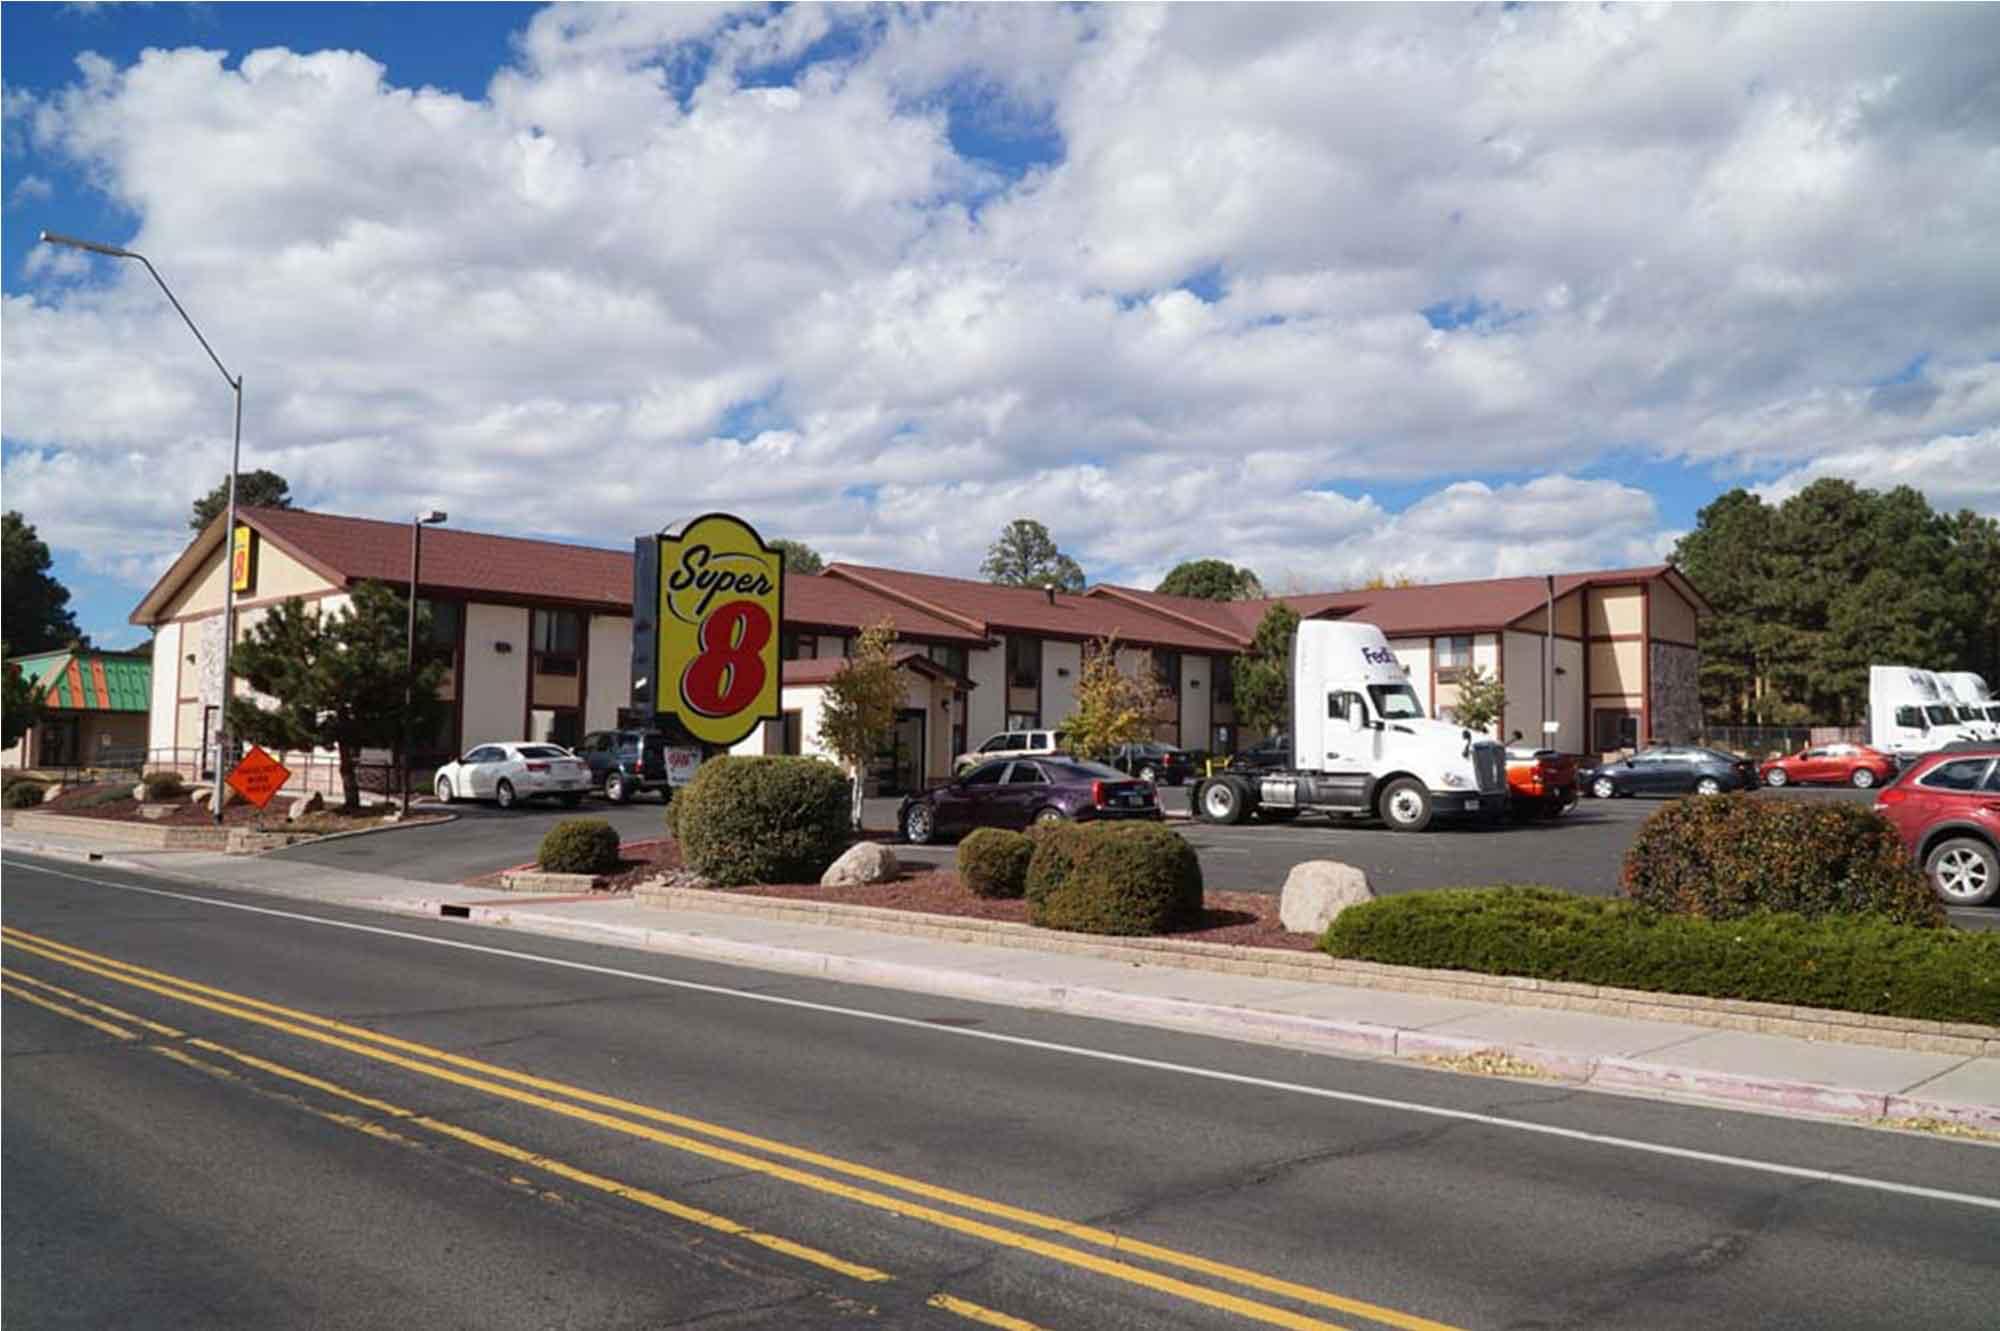 USA, Arizona, Flagstaff, Super 8